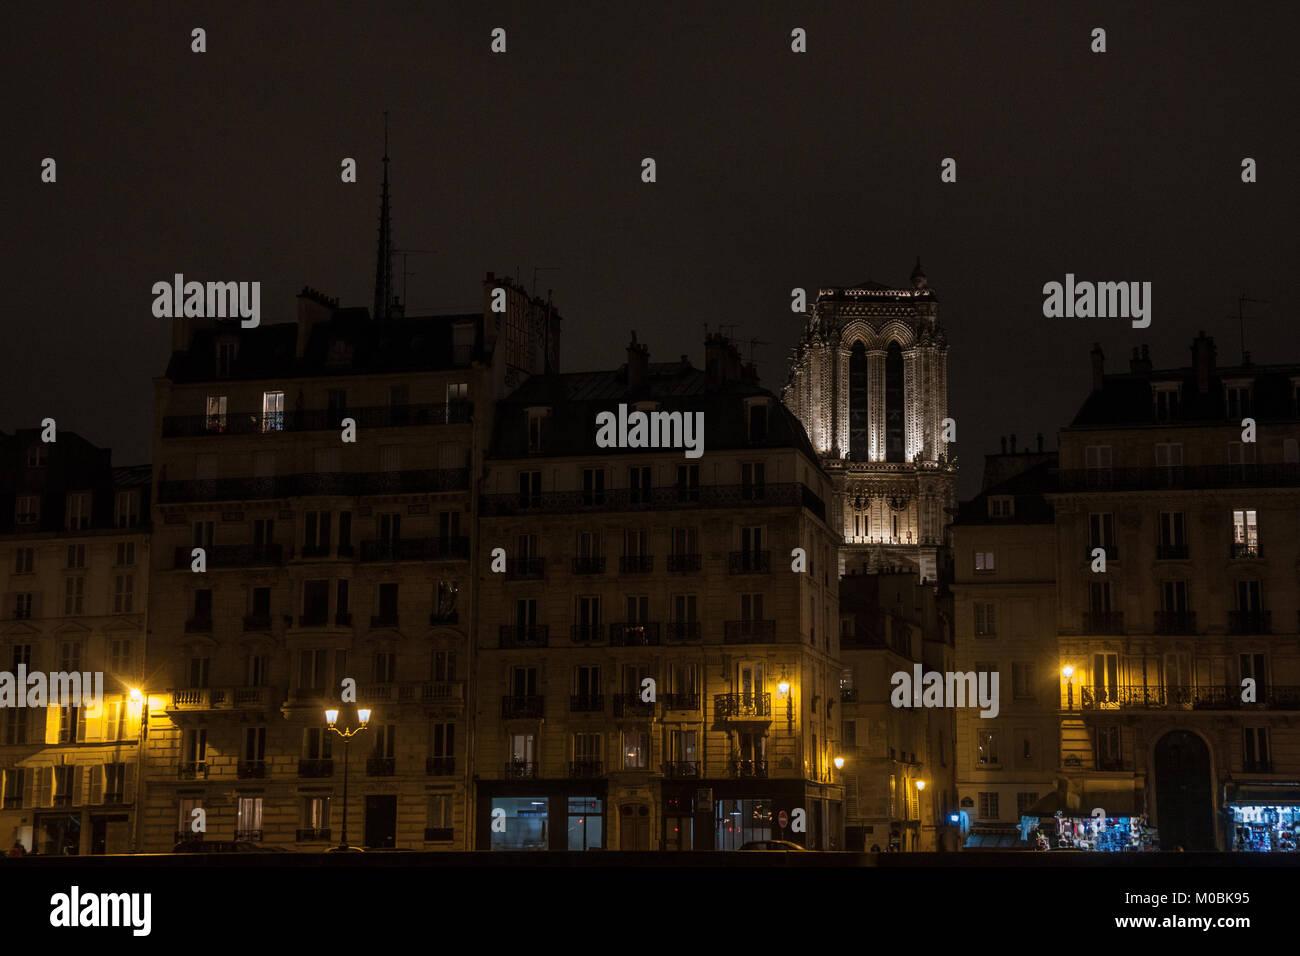 Notre Dame de Paris cathedral surrounded by medieval residential buildings typical from Ile de la Cite in Paris, - Stock Image